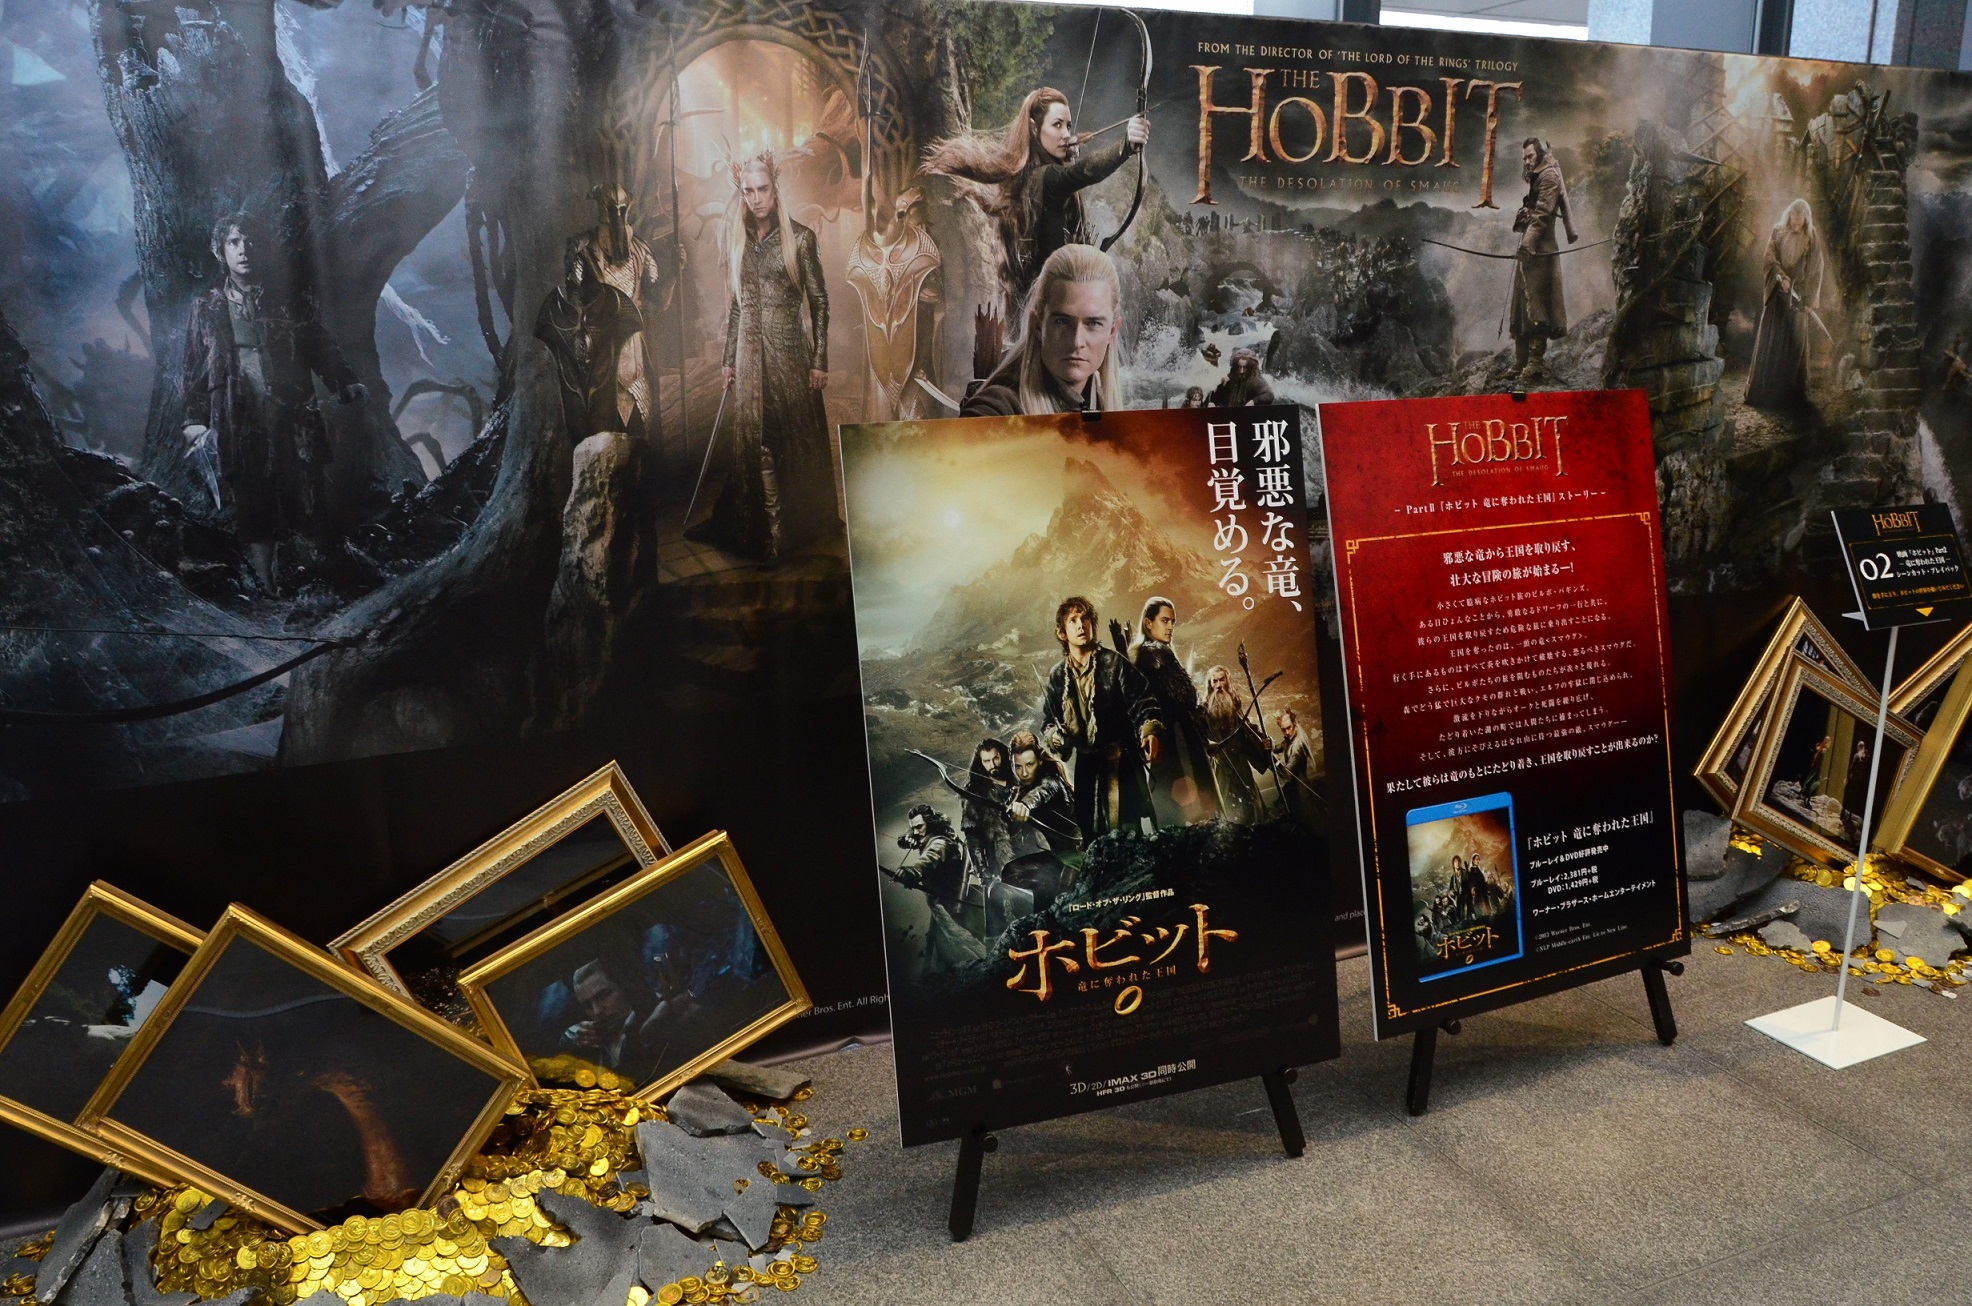 hobbit5.jpg